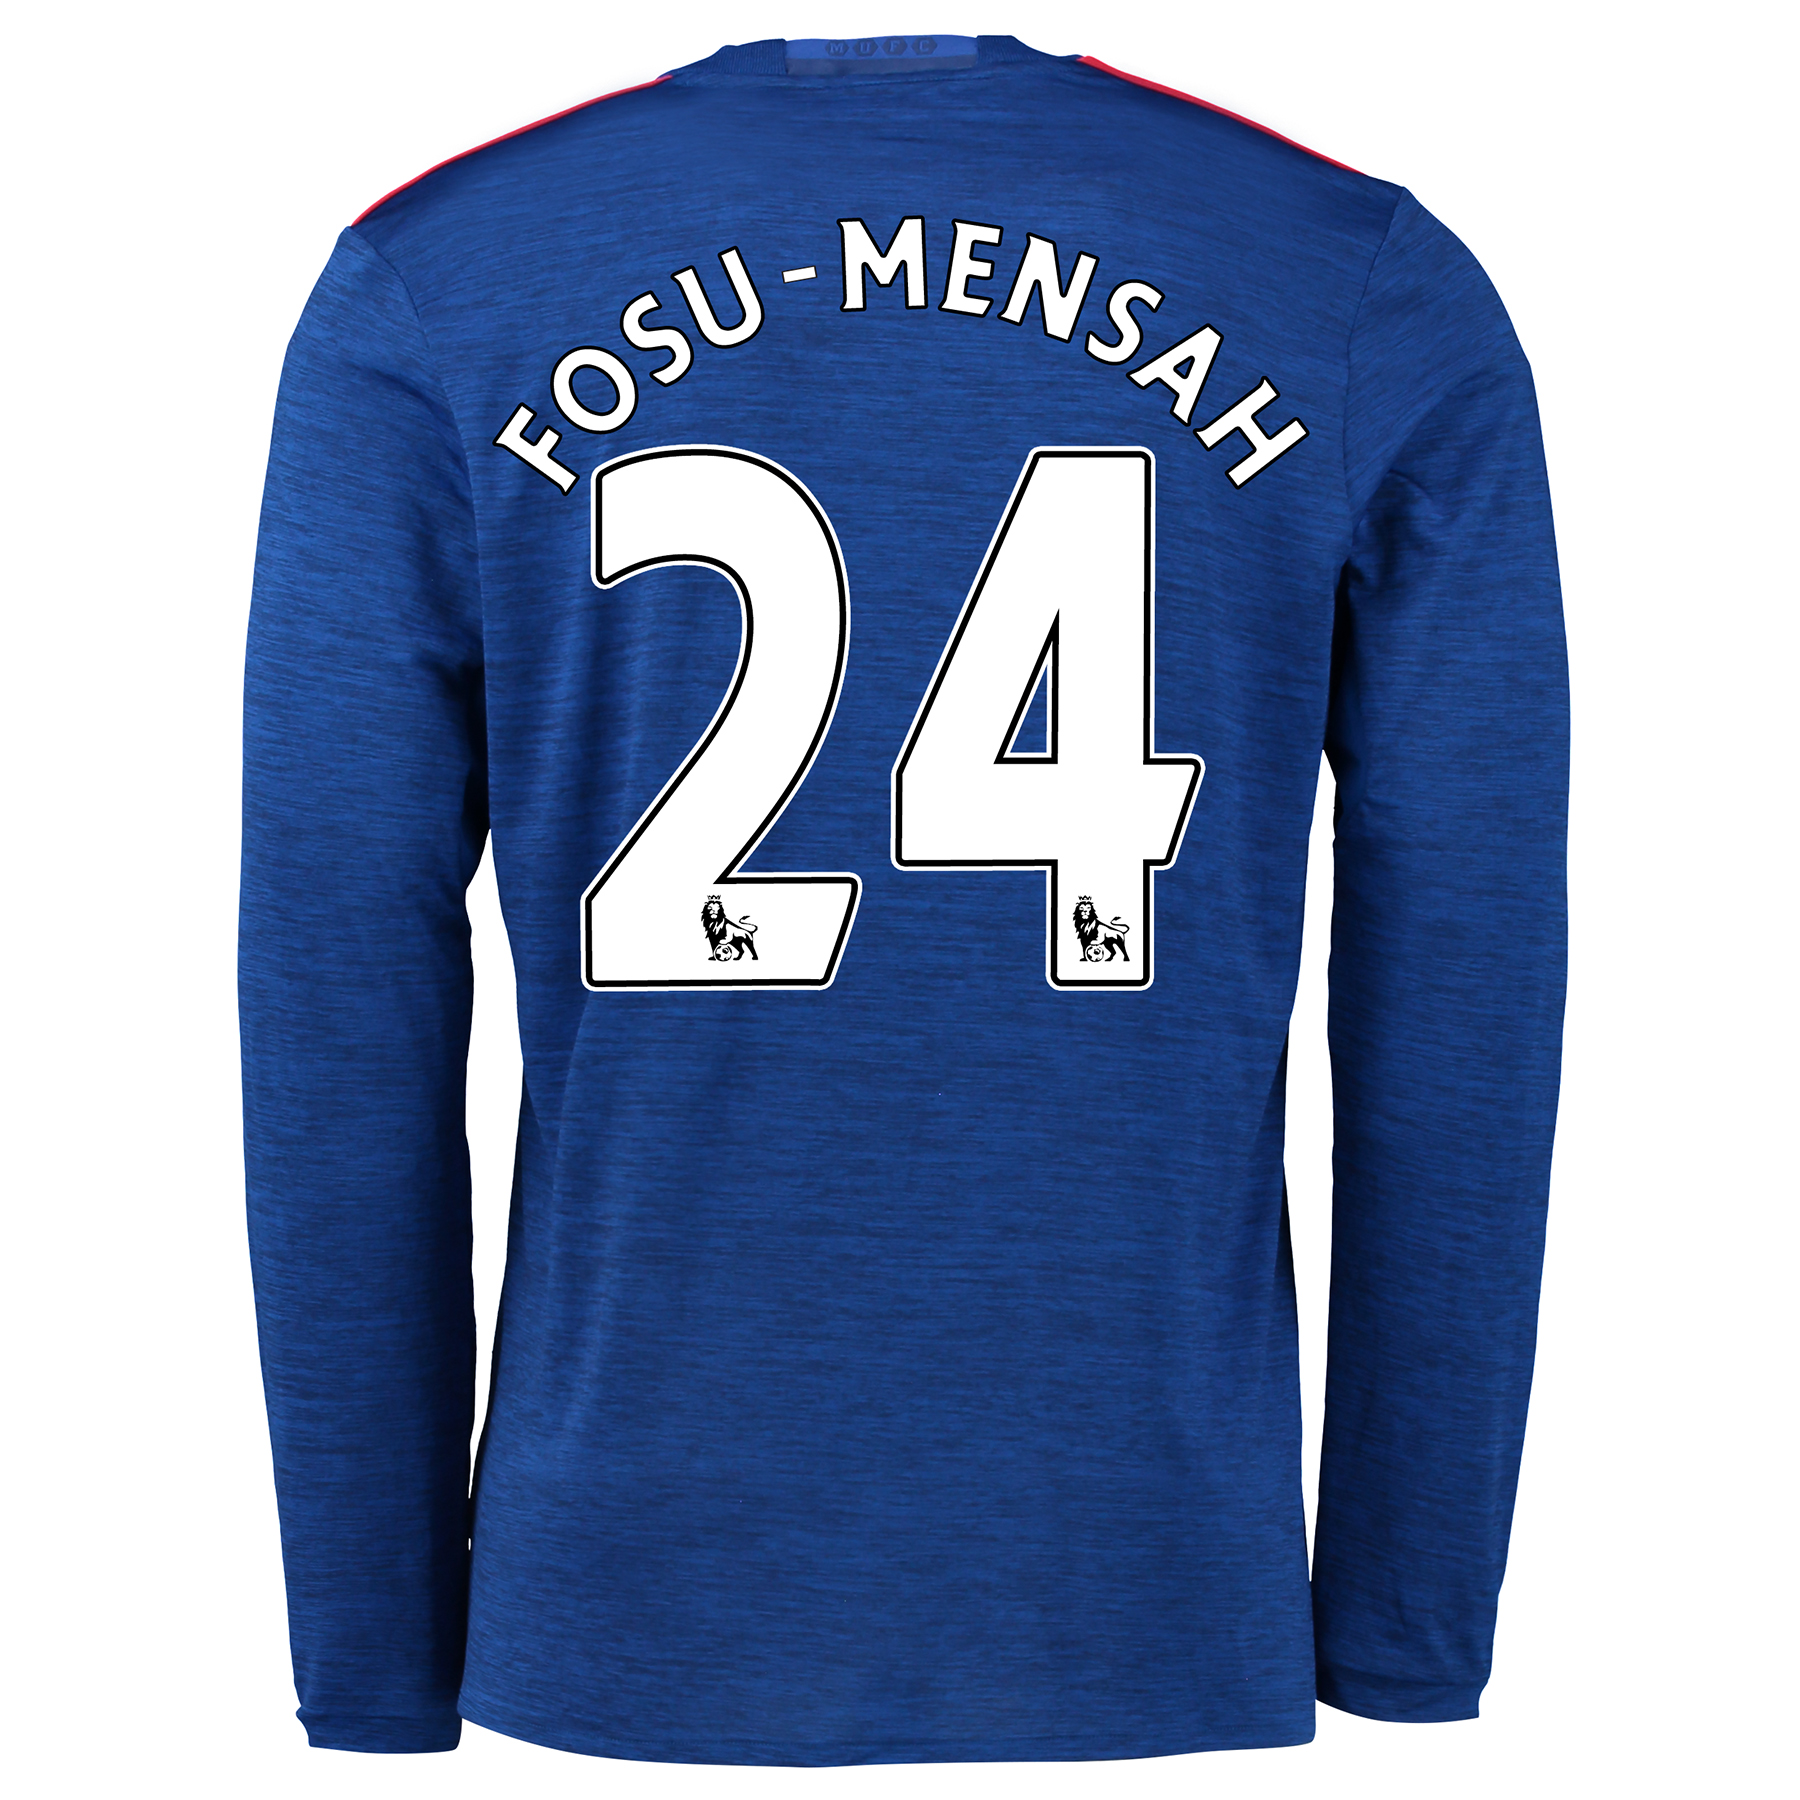 Manchester United Away Shirt 2016-17 - Long Sleeve with Fosu-Mensah 24